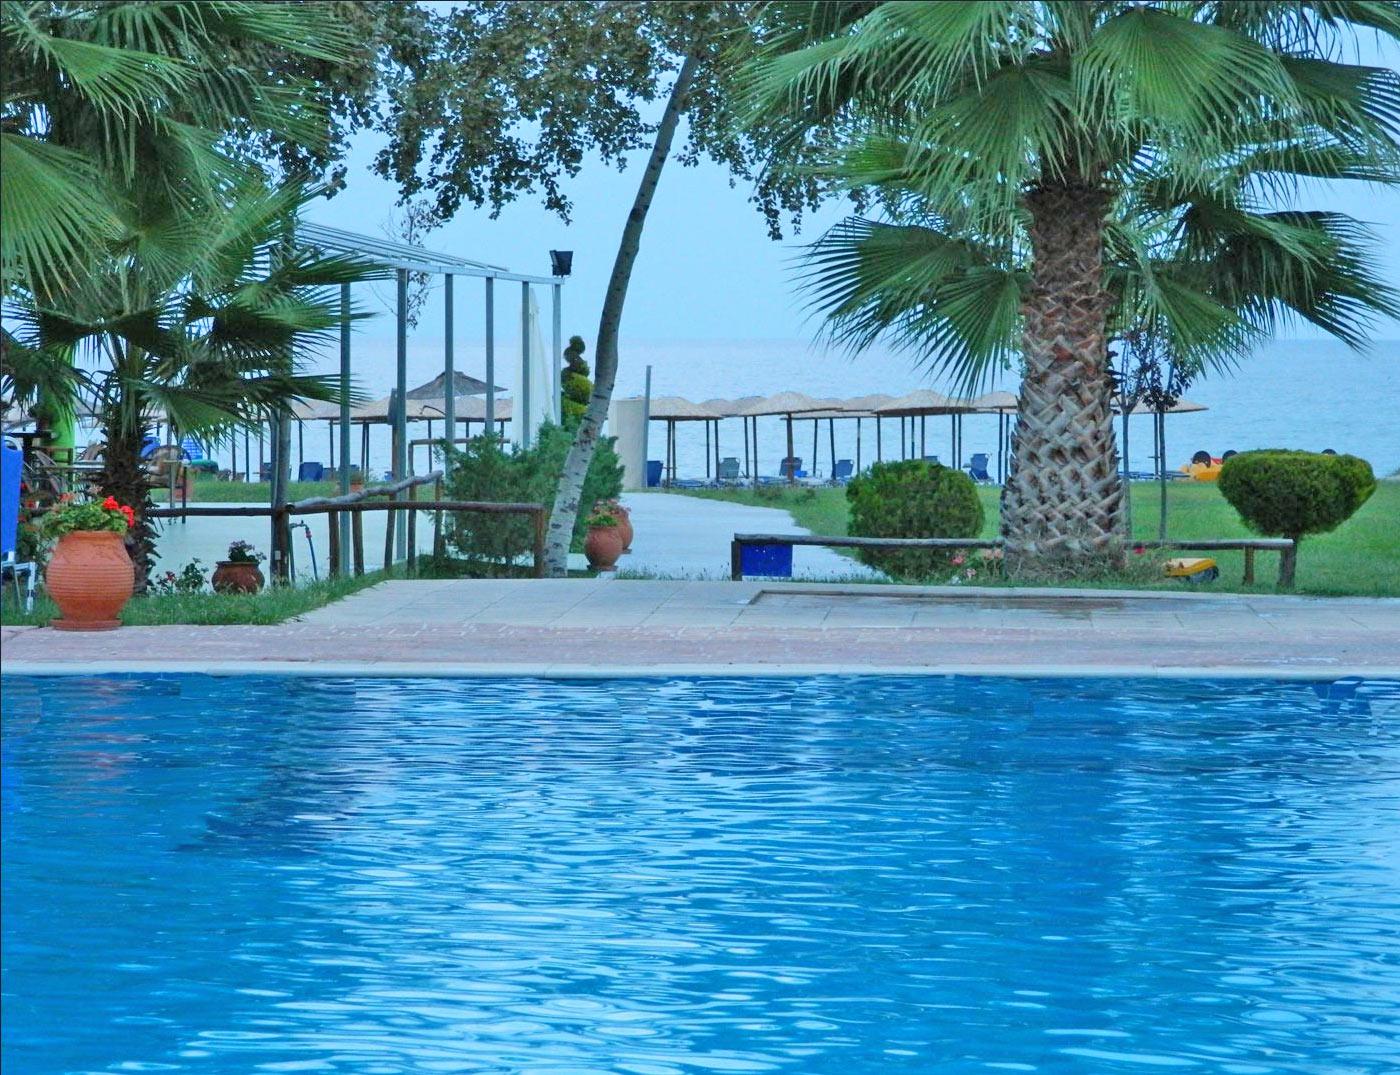 http://www.adielatravel.ro/riviera-olimpului/platamonas/Hotel%20Sun%20Beach%20Platamonas%203/platamonas%20hotel%20sun%20beach%20platamonas%209.jpg